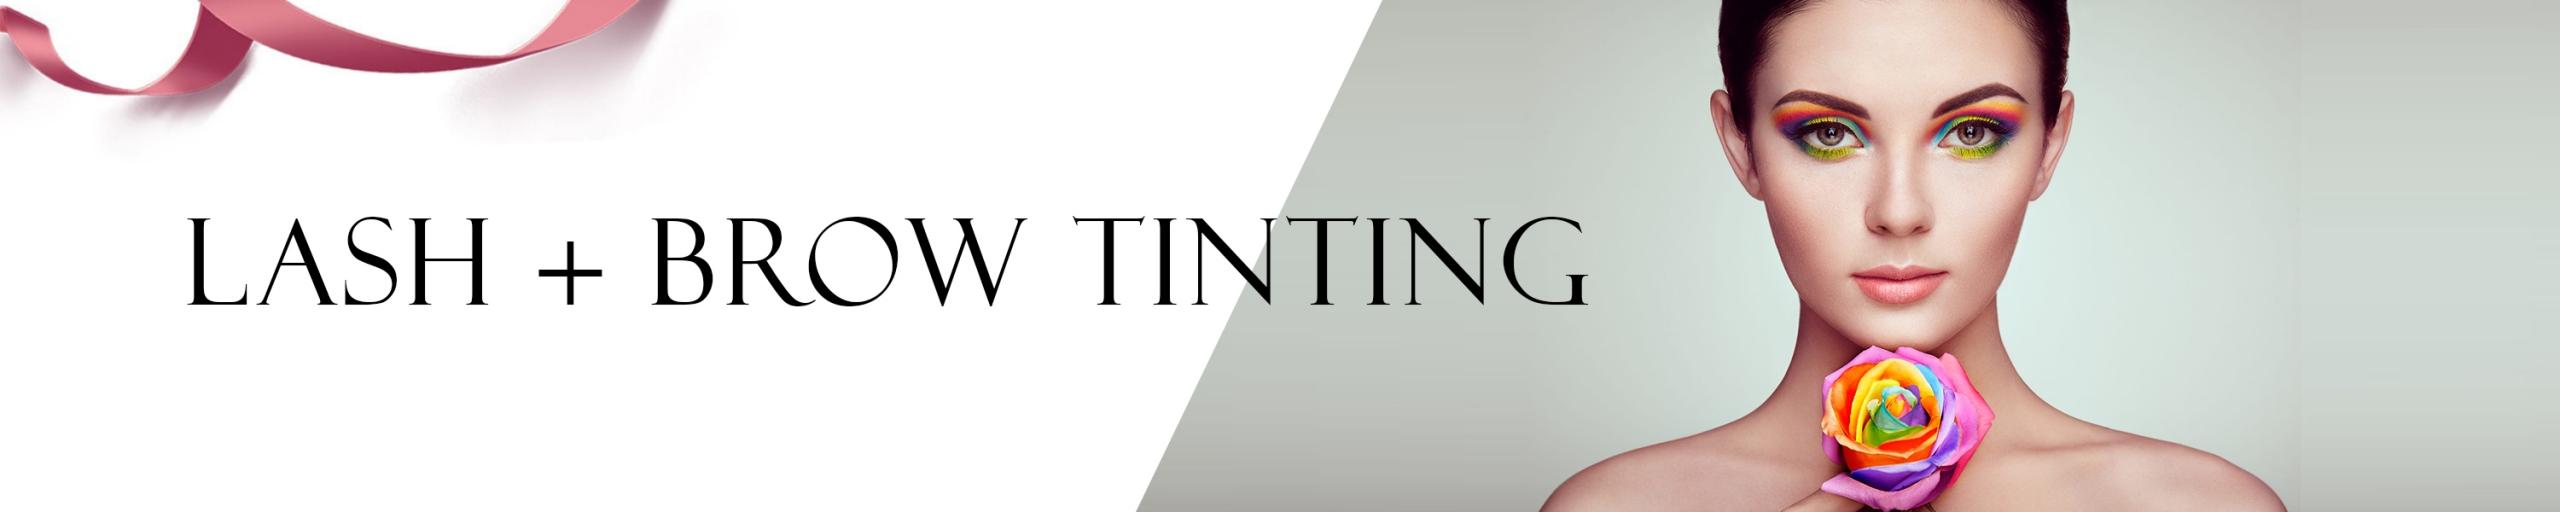 Lash + Brow Tinting